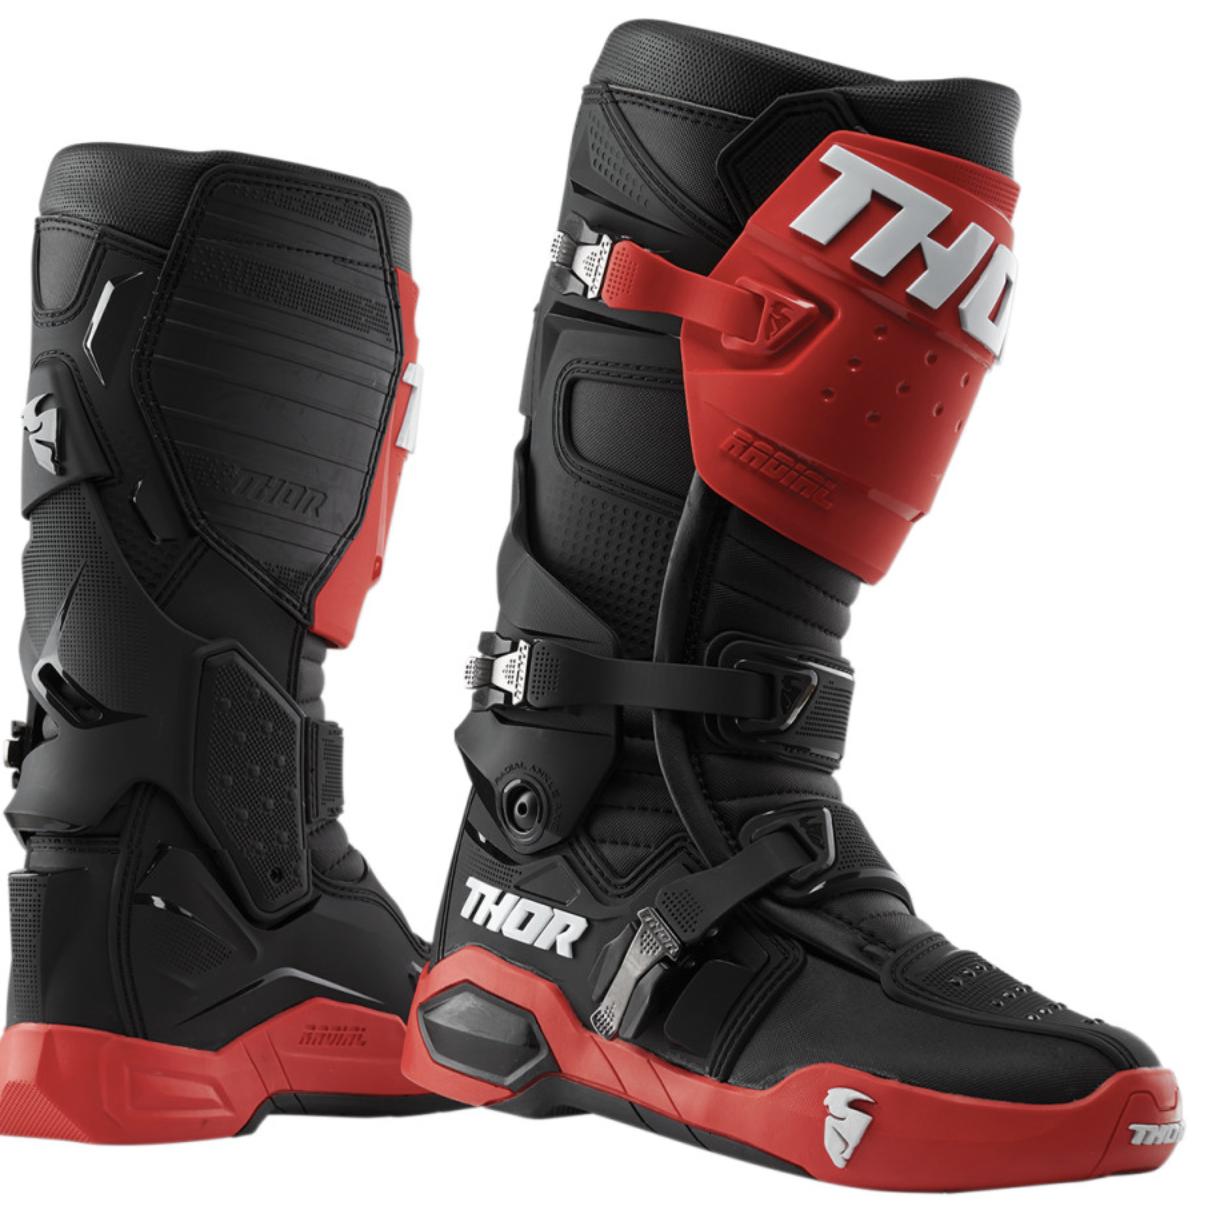 Thor Racing motocross boot